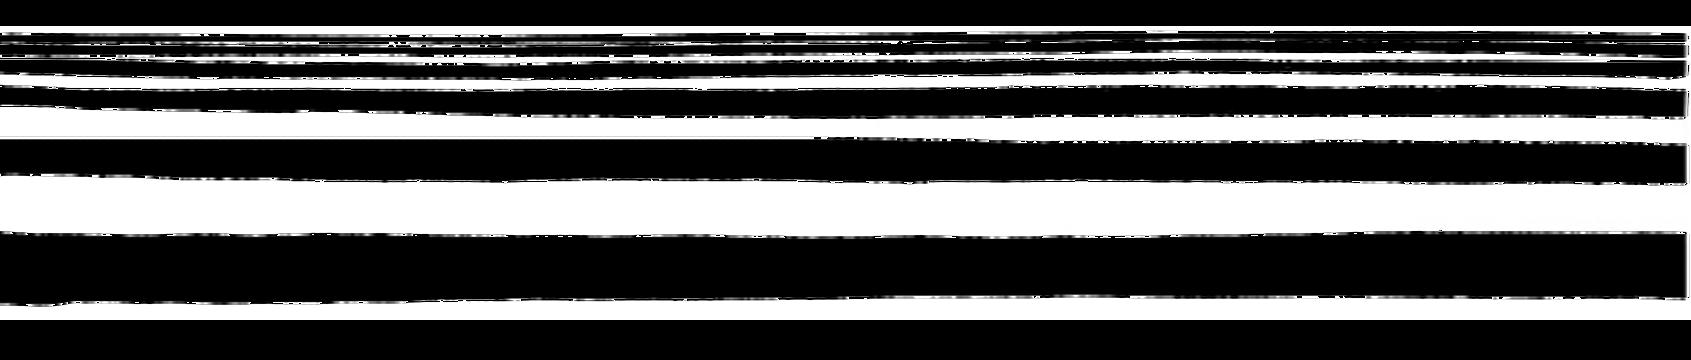 Stripes.png